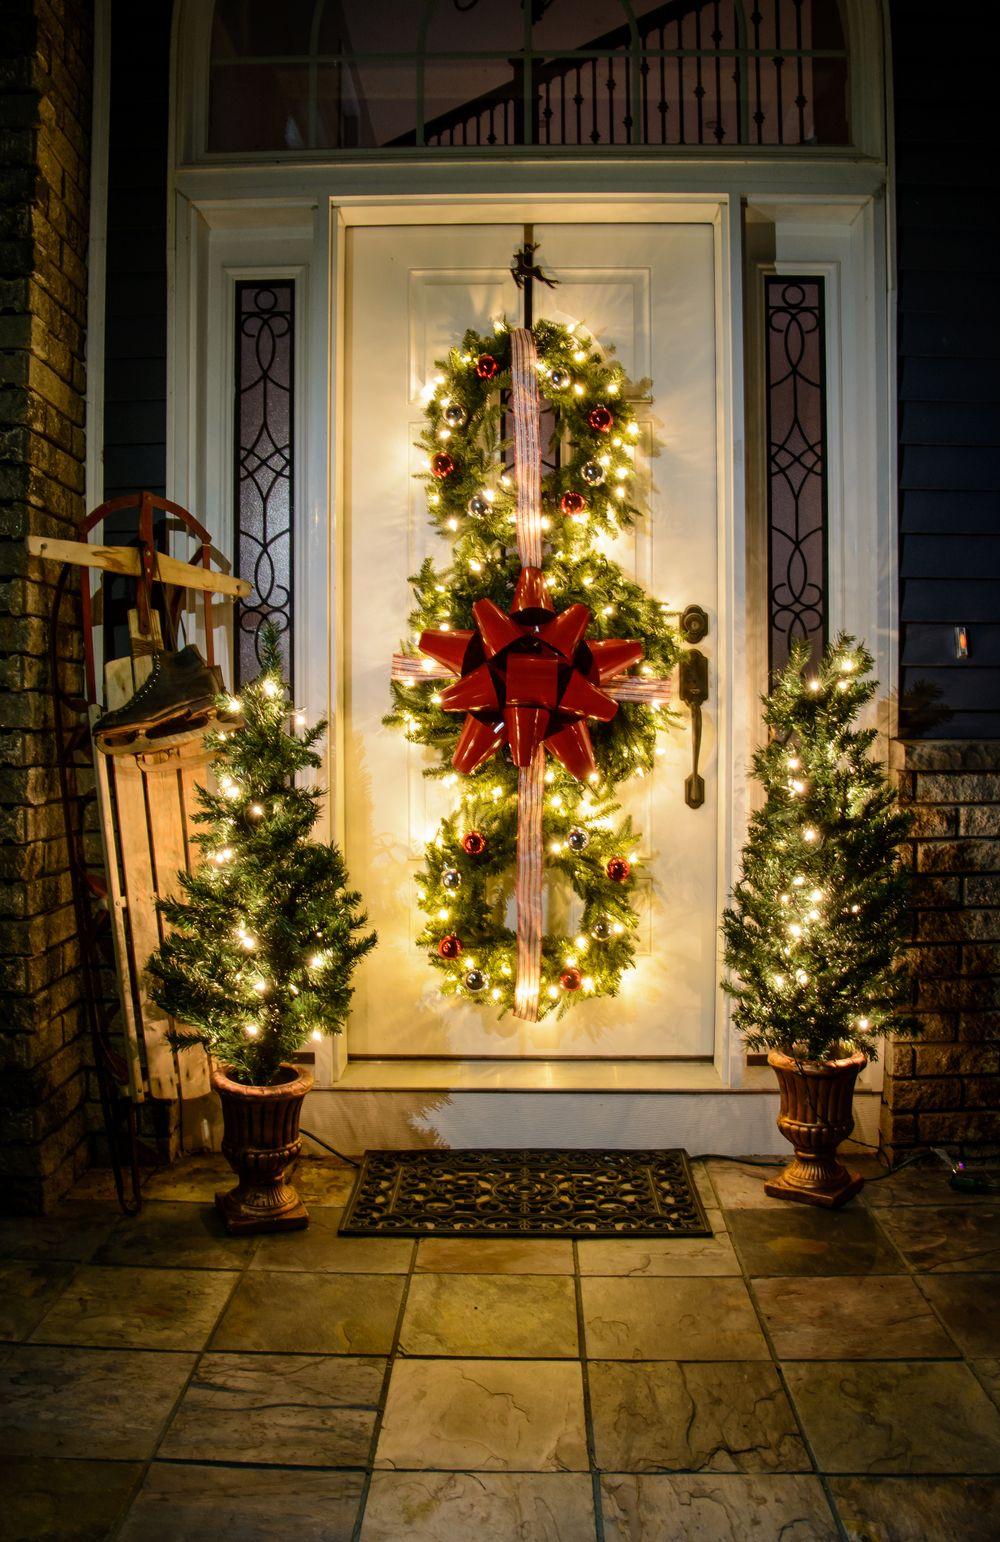 50 best christmas porch decoration ideas for 2016 - Christmas Front Porch Decorations Pinterest